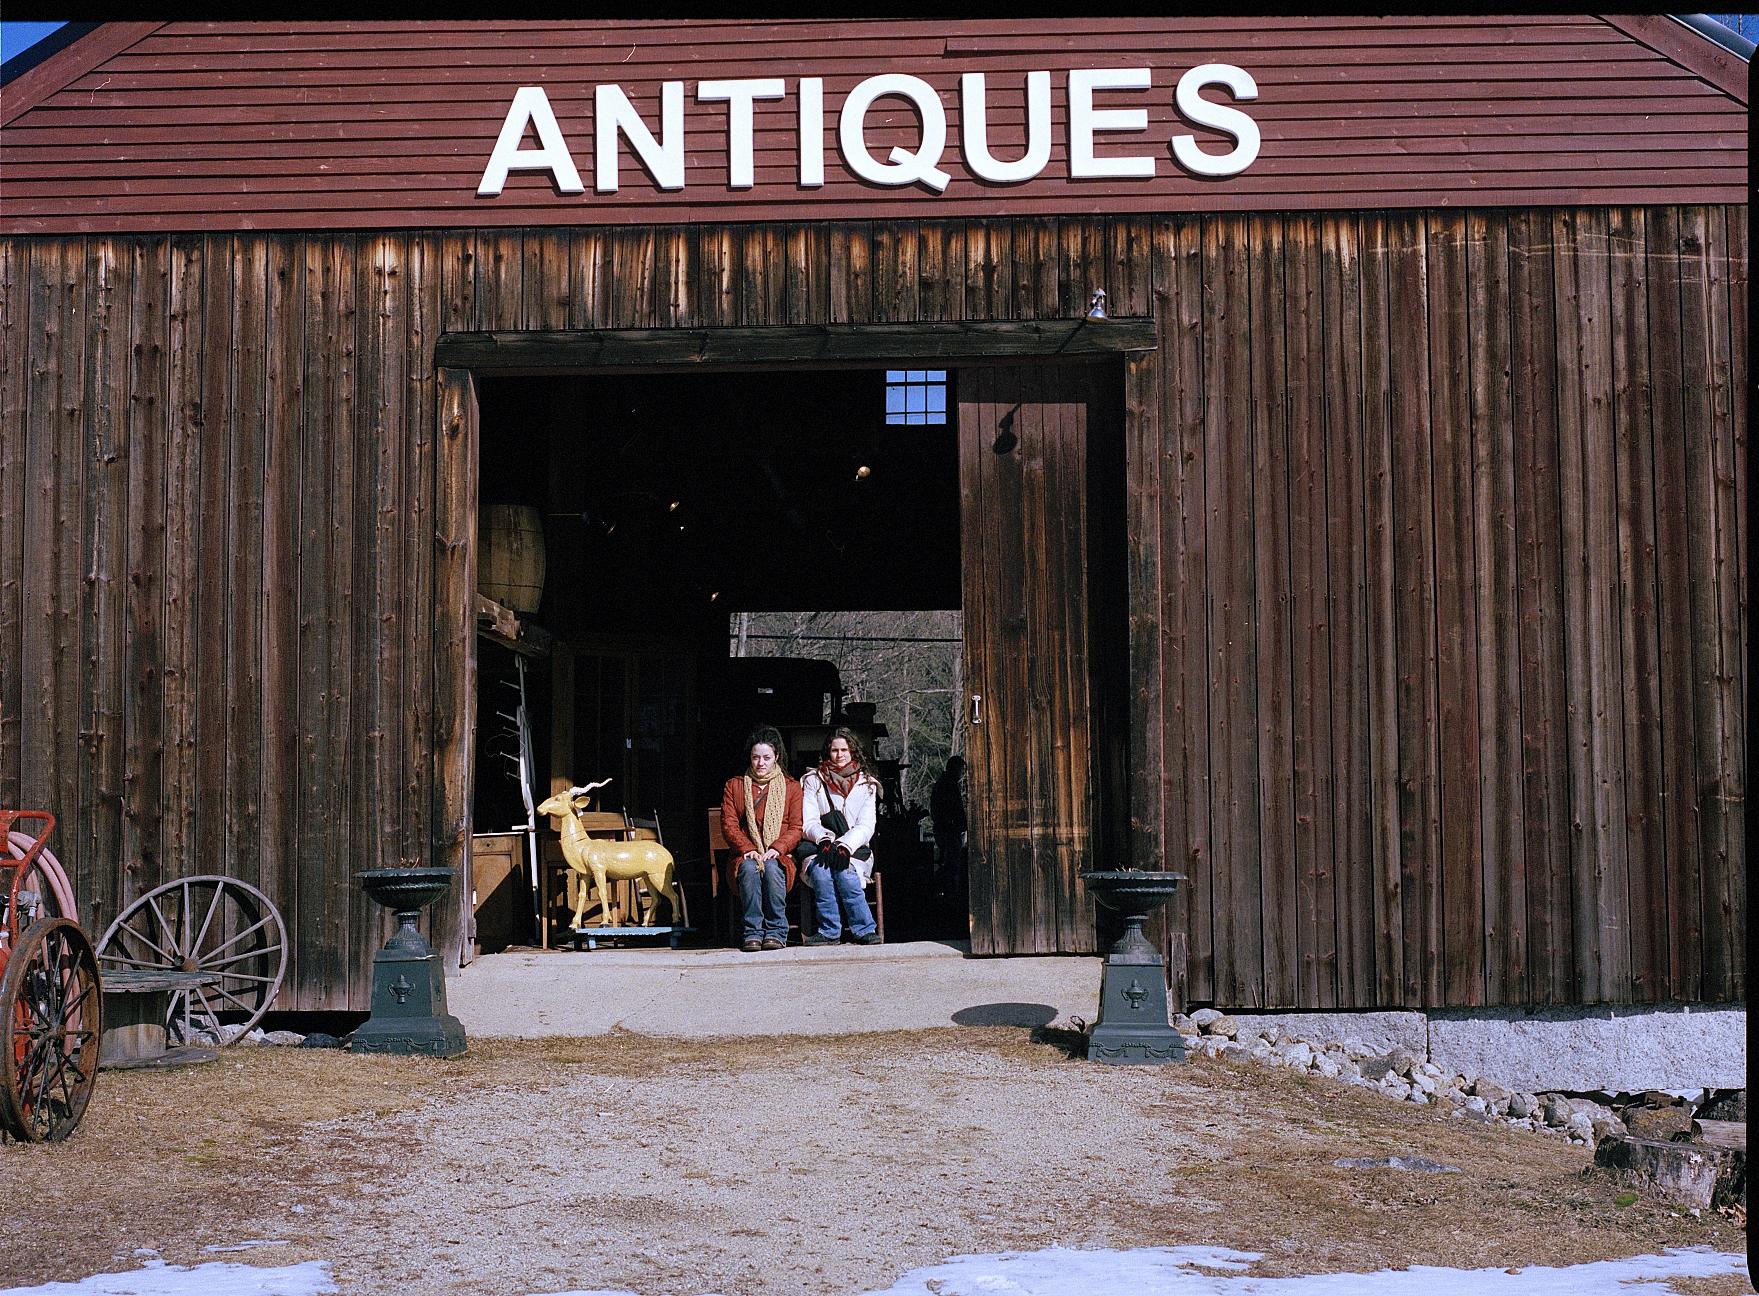 antiques2.jpg